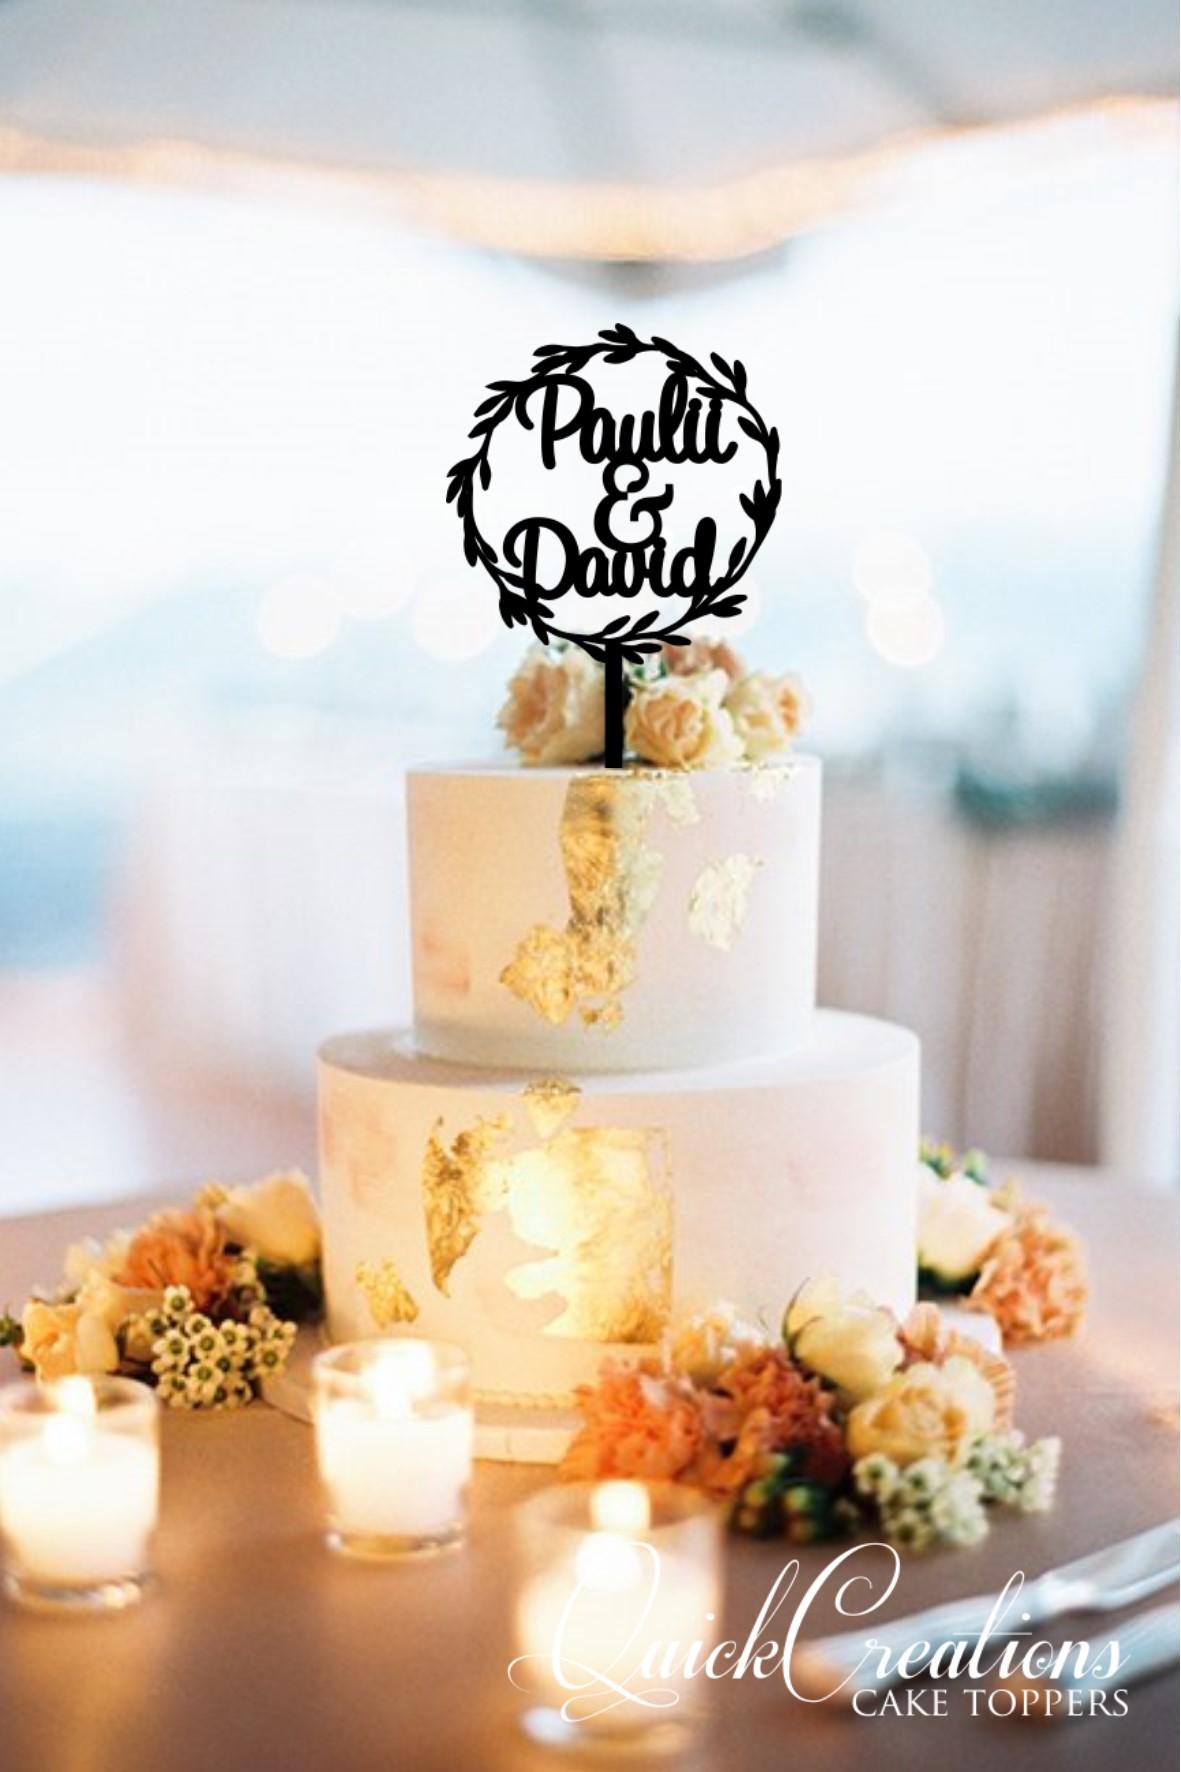 Quick Creations Cake Topper - Wreah Paulii & David